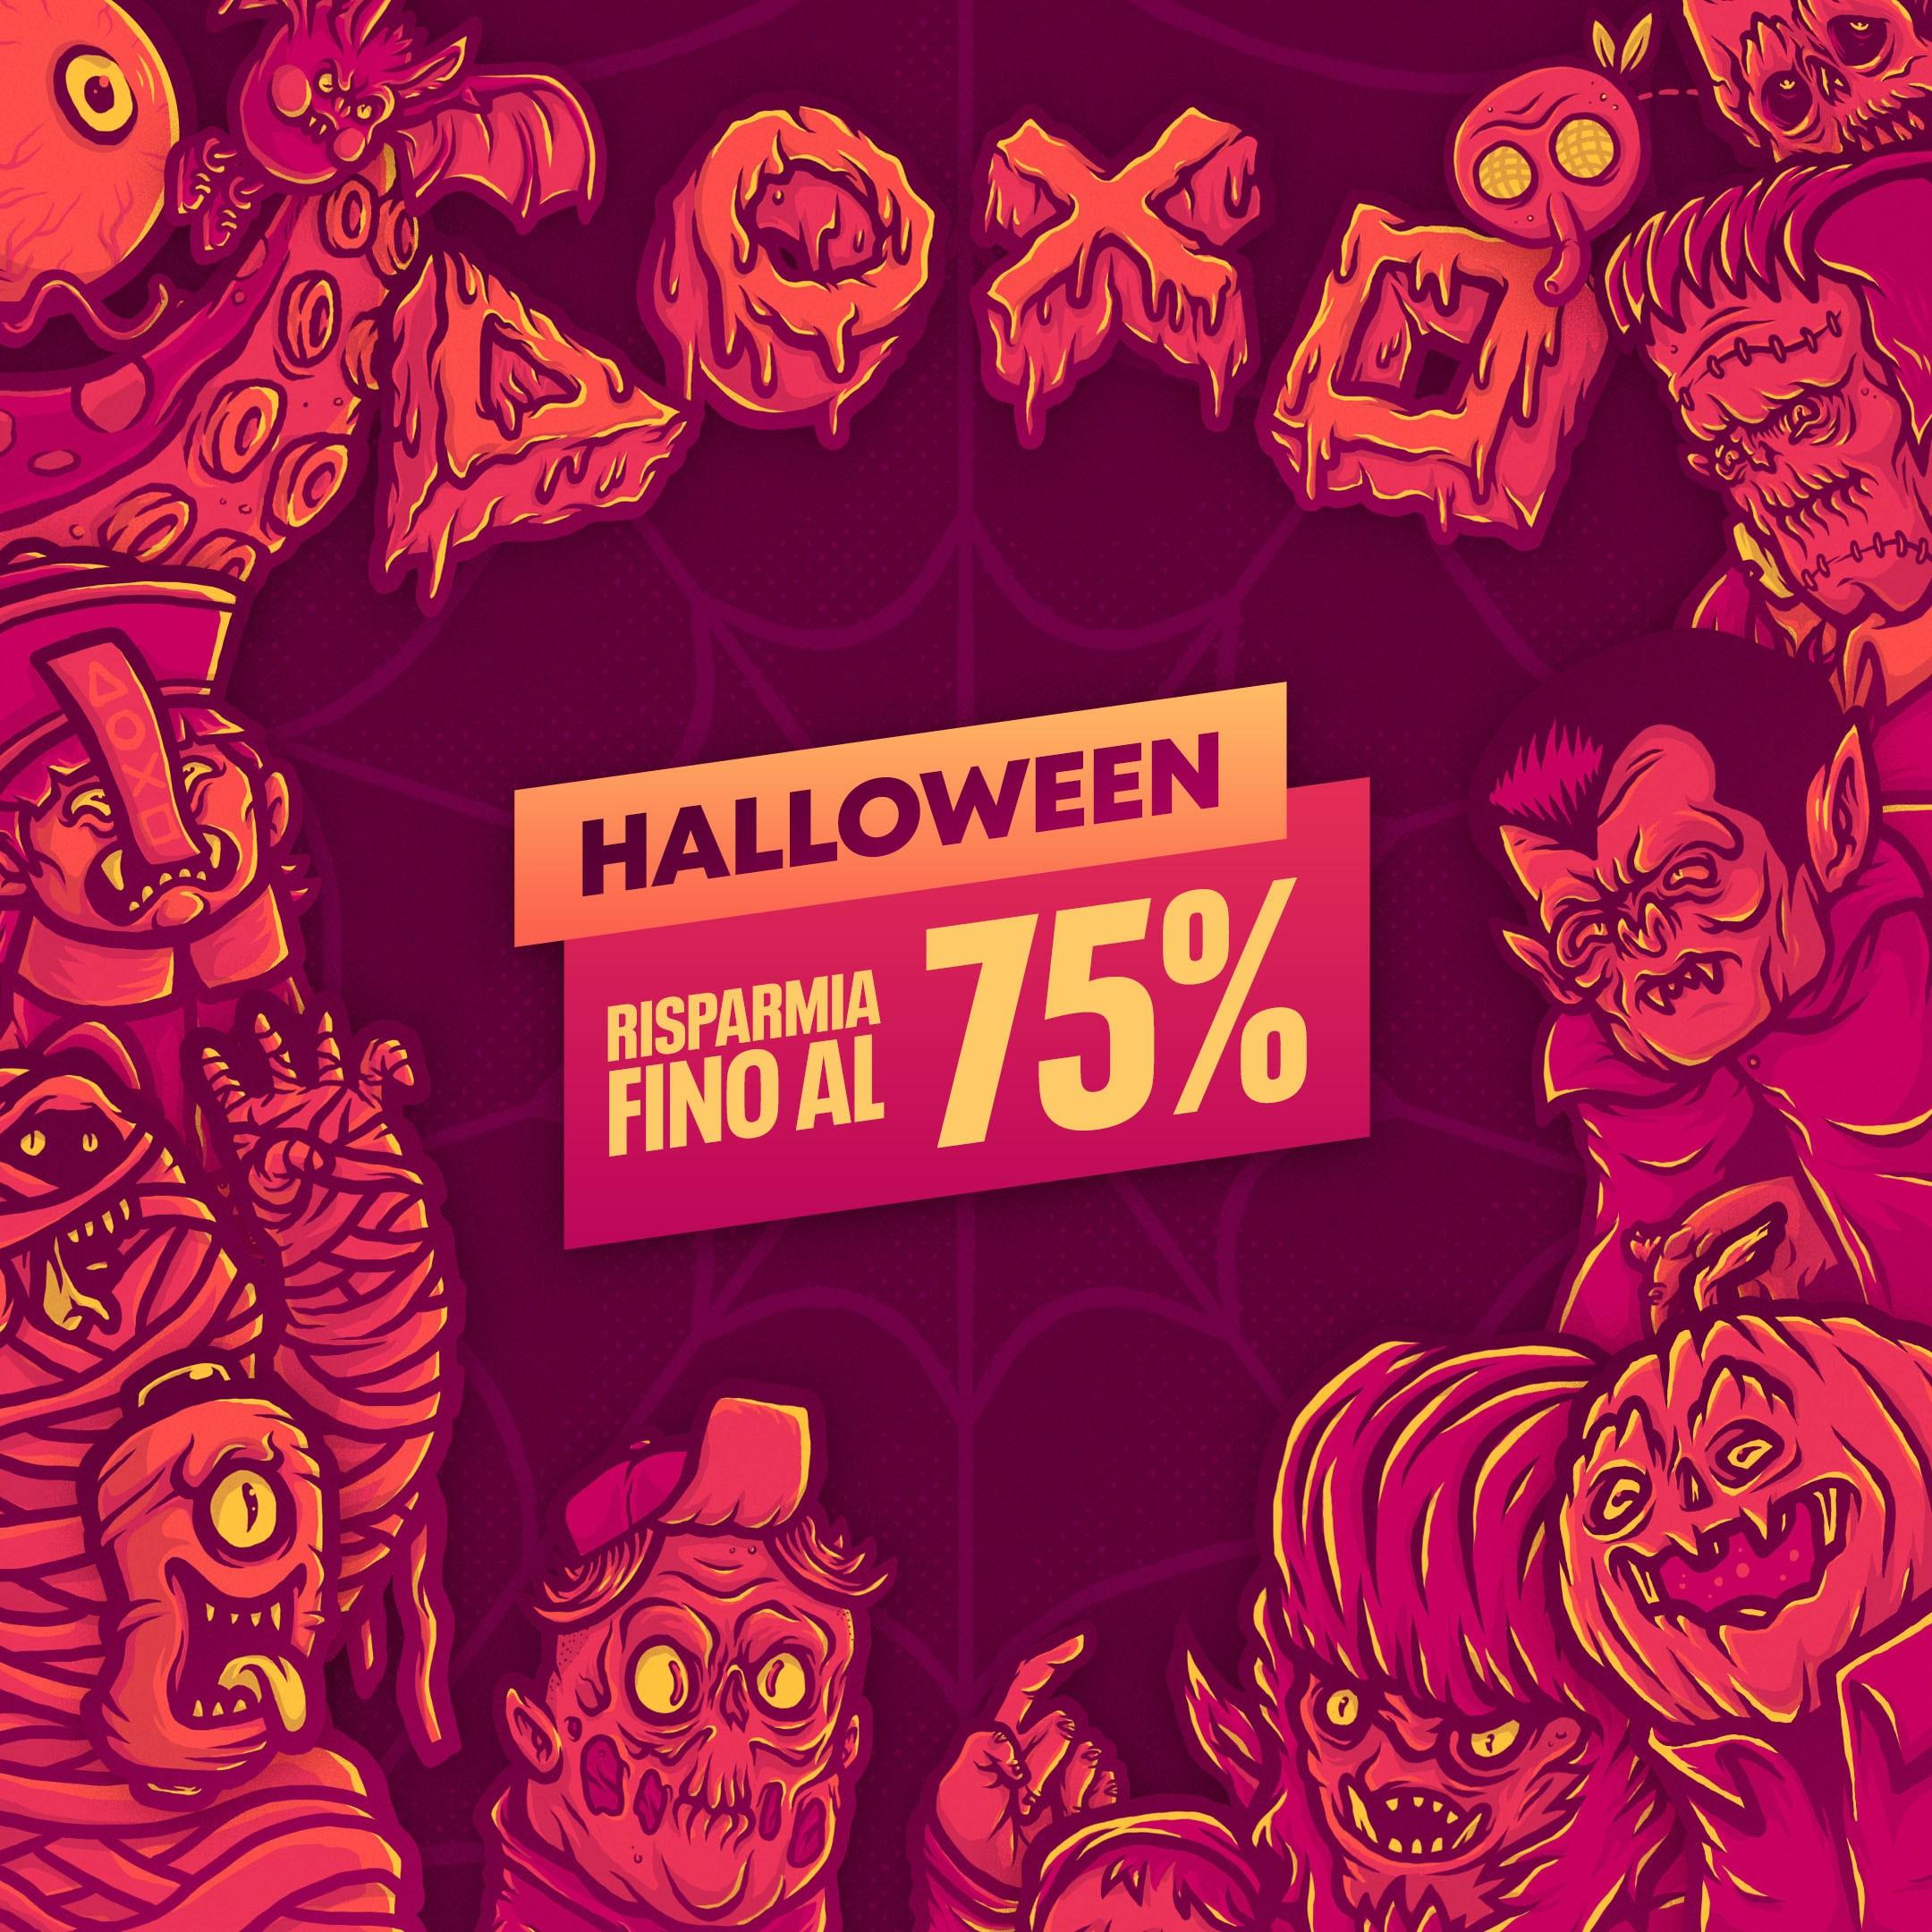 [PROMO] Halloween